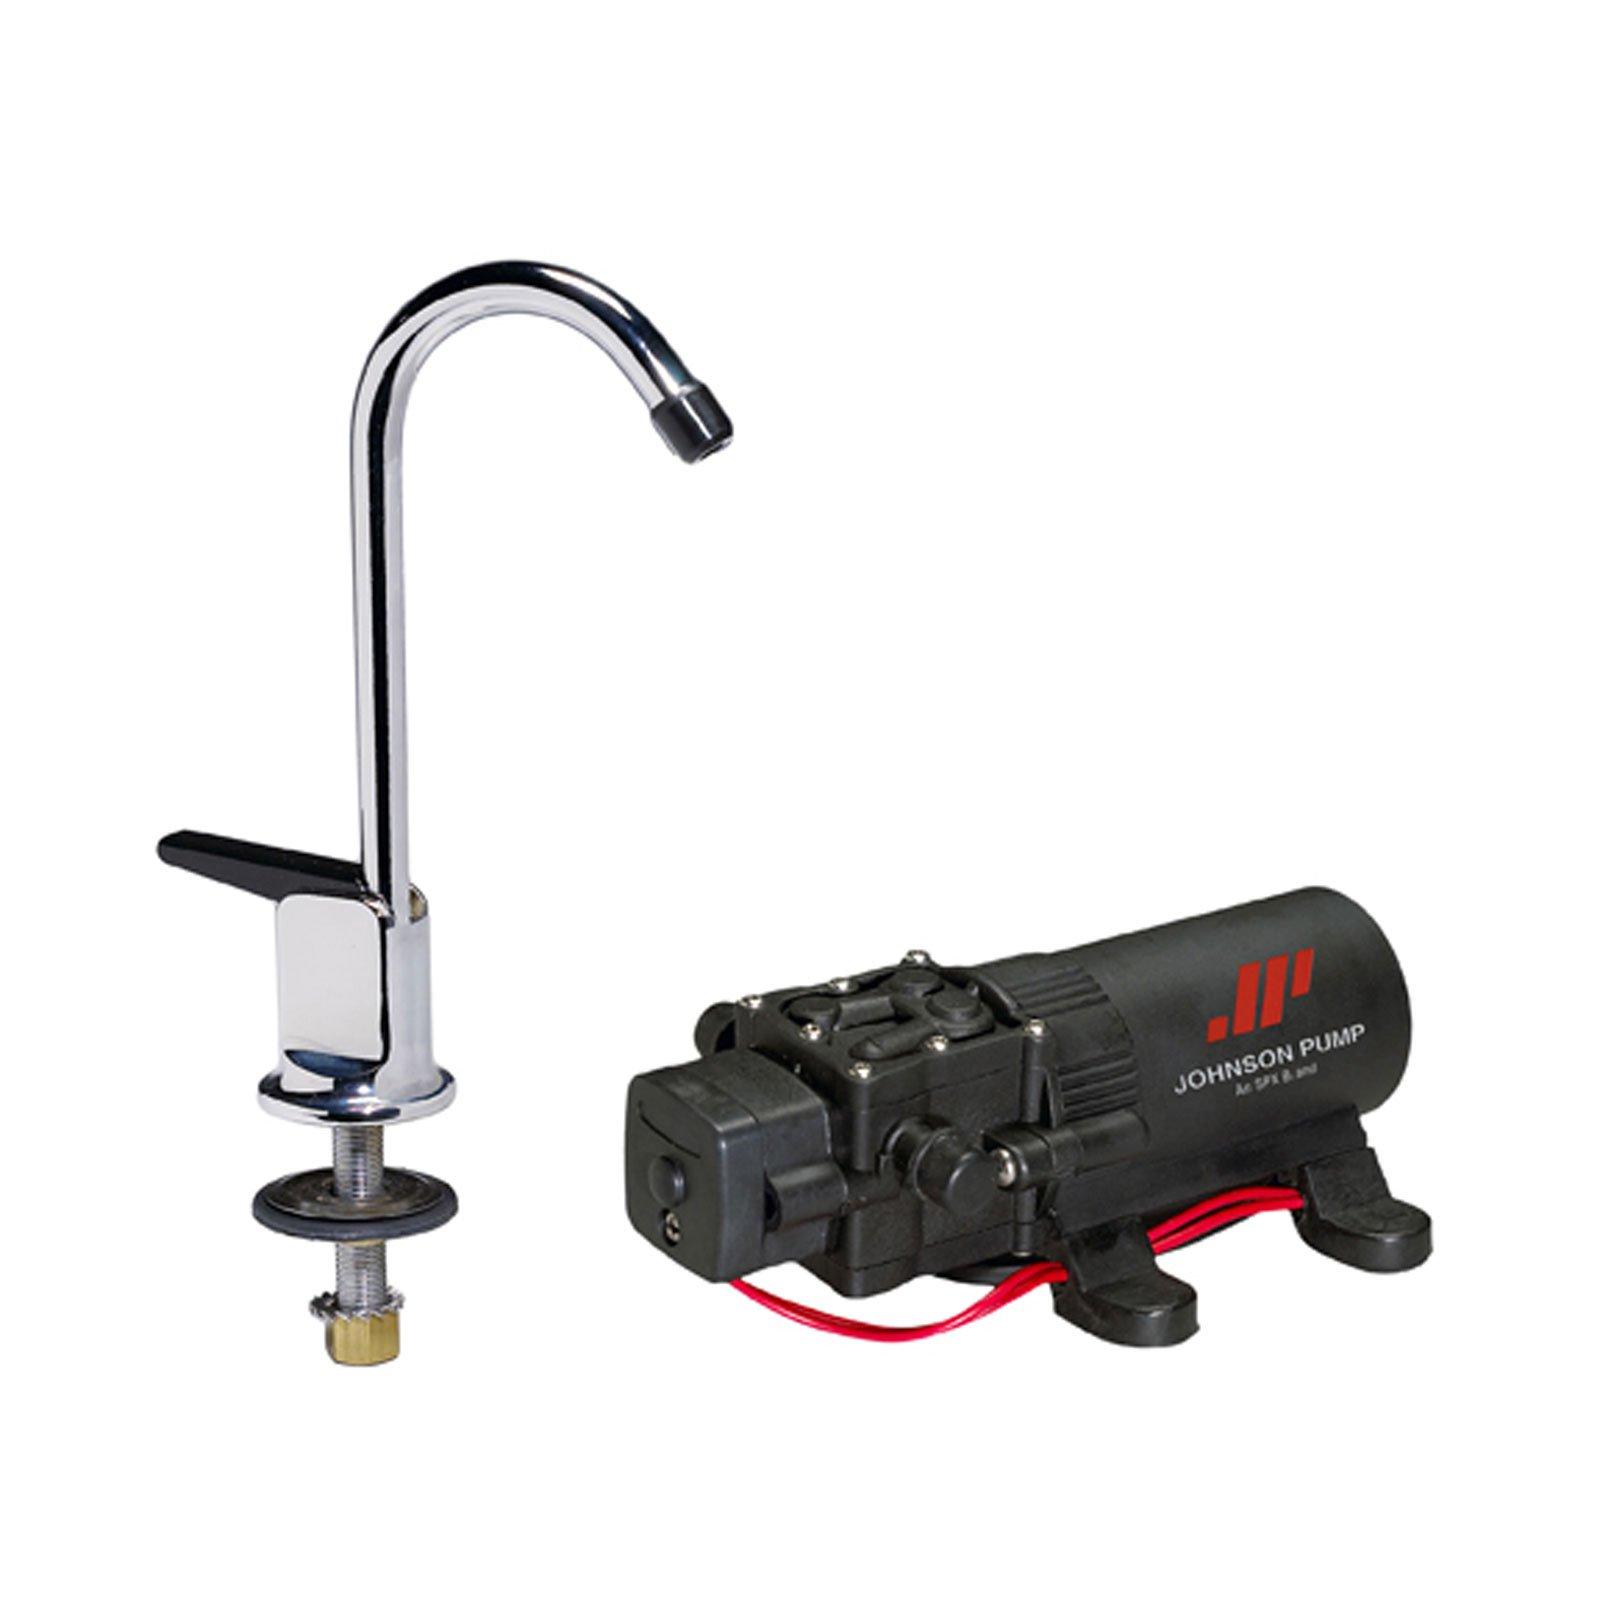 Johnson Pumps 61123 1.1 12V WPS/Faucet Combo, 15-Inch